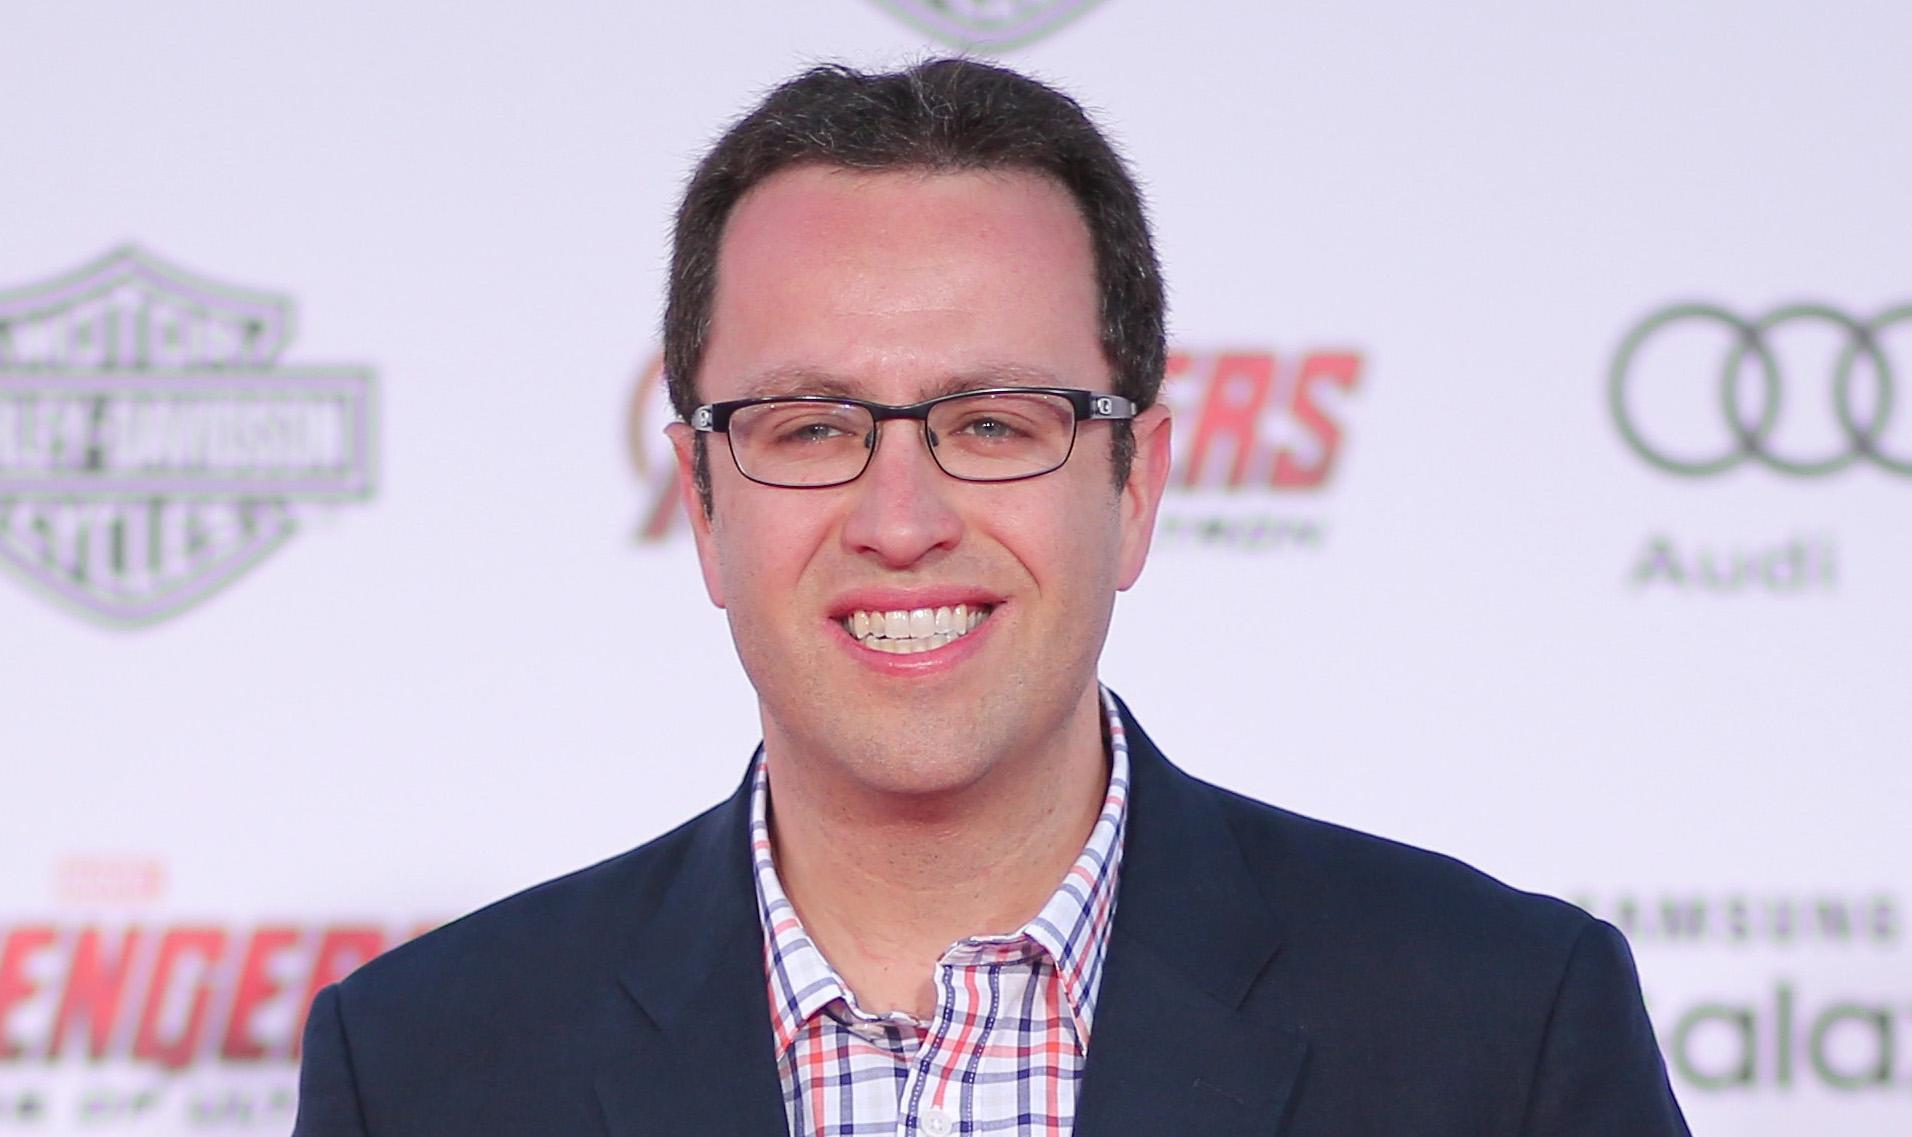 Subway Suspends Relationship With Jared Fogle Amid Child Pornography Scandal   Jared Fogle : Just Jared